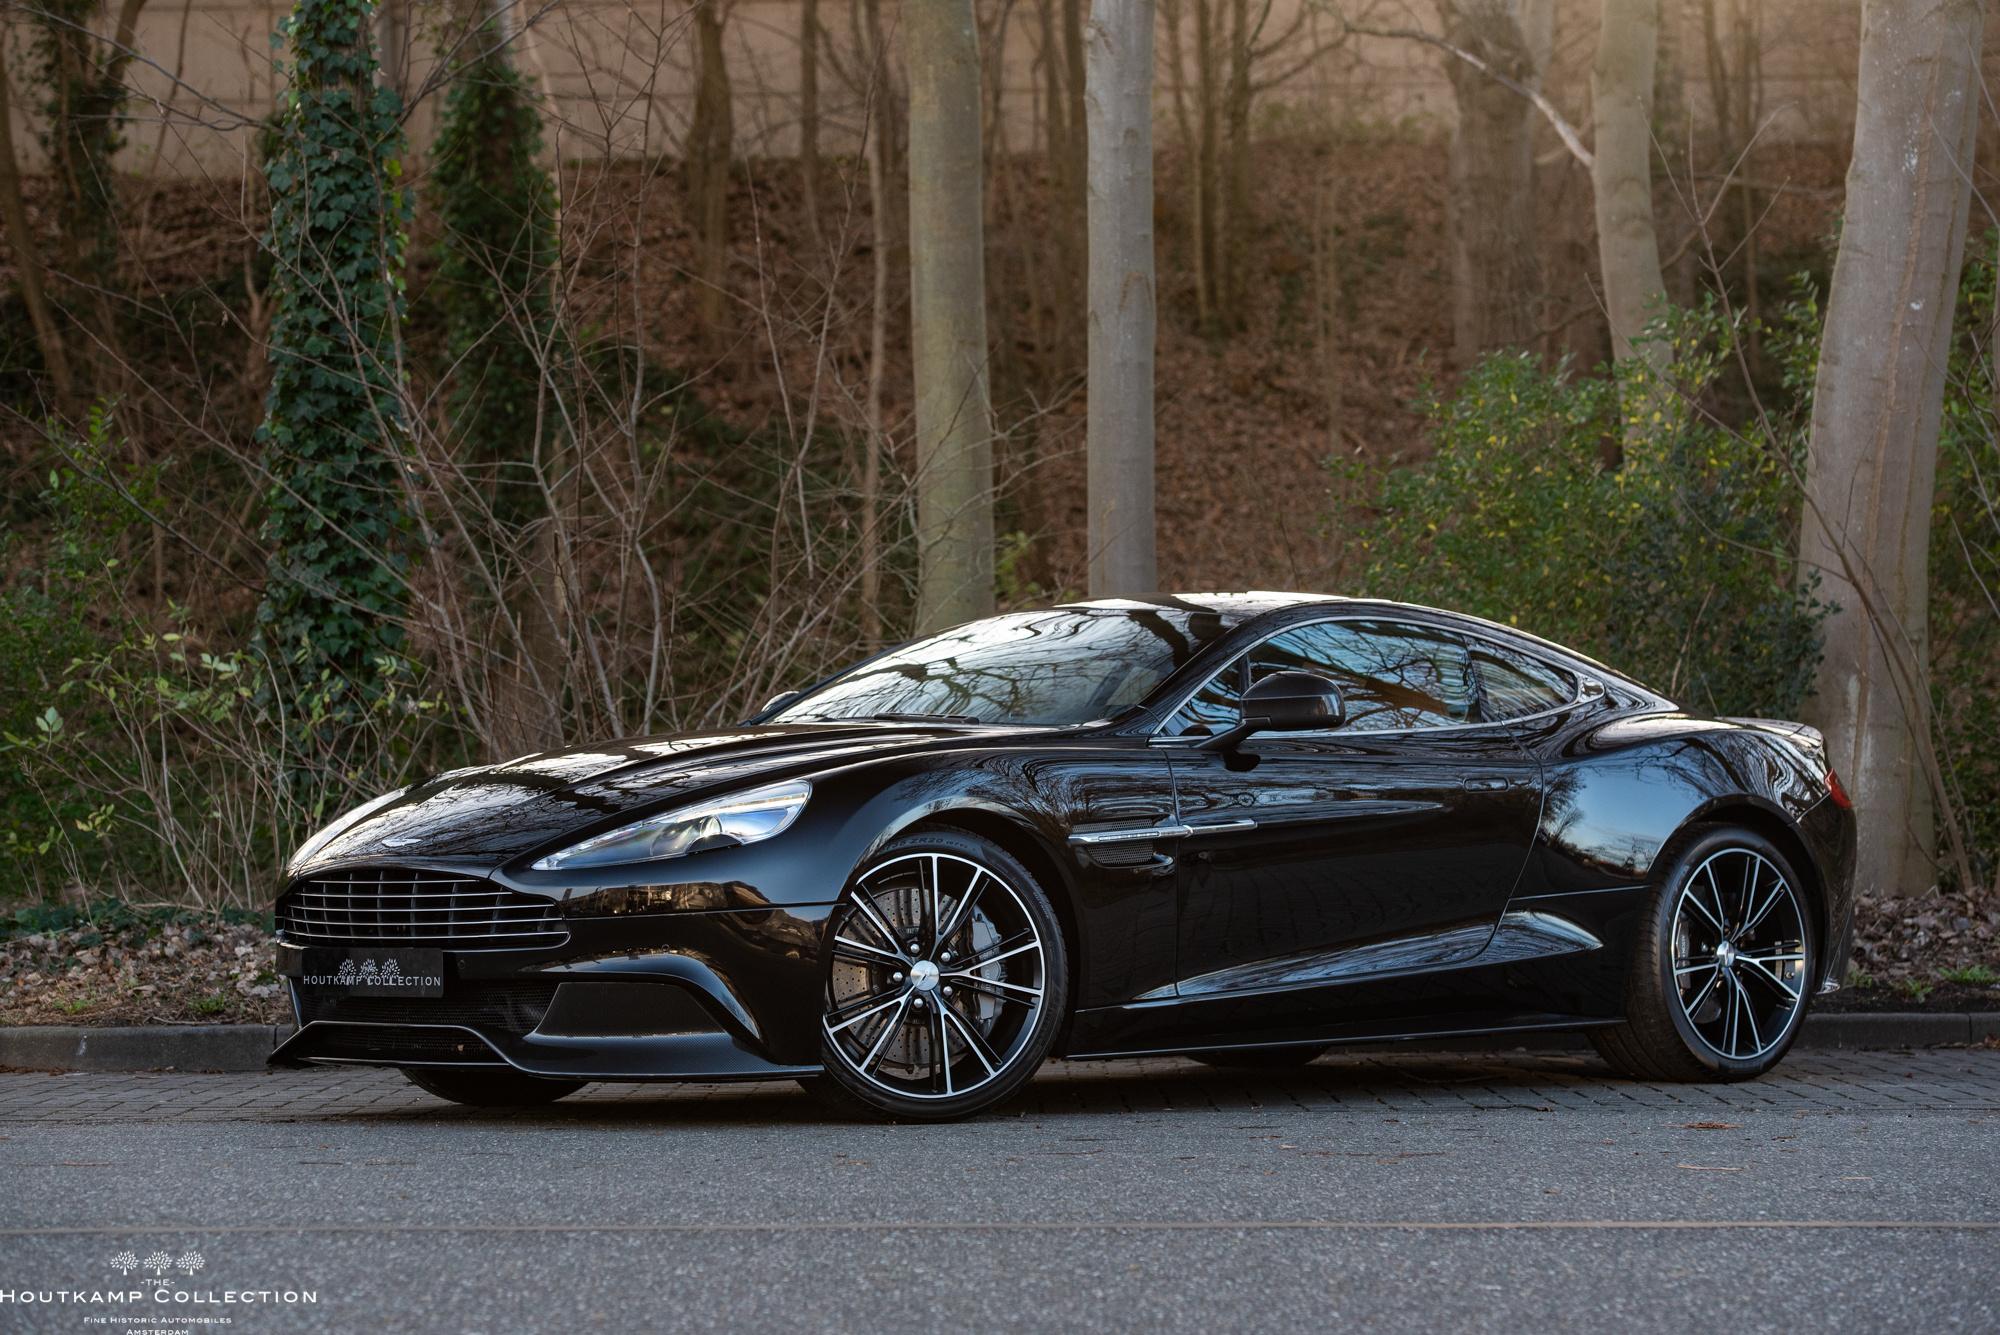 2013 Aston Martin Vanquish Just 17 900 Since Its First Registration Classic Driver Market